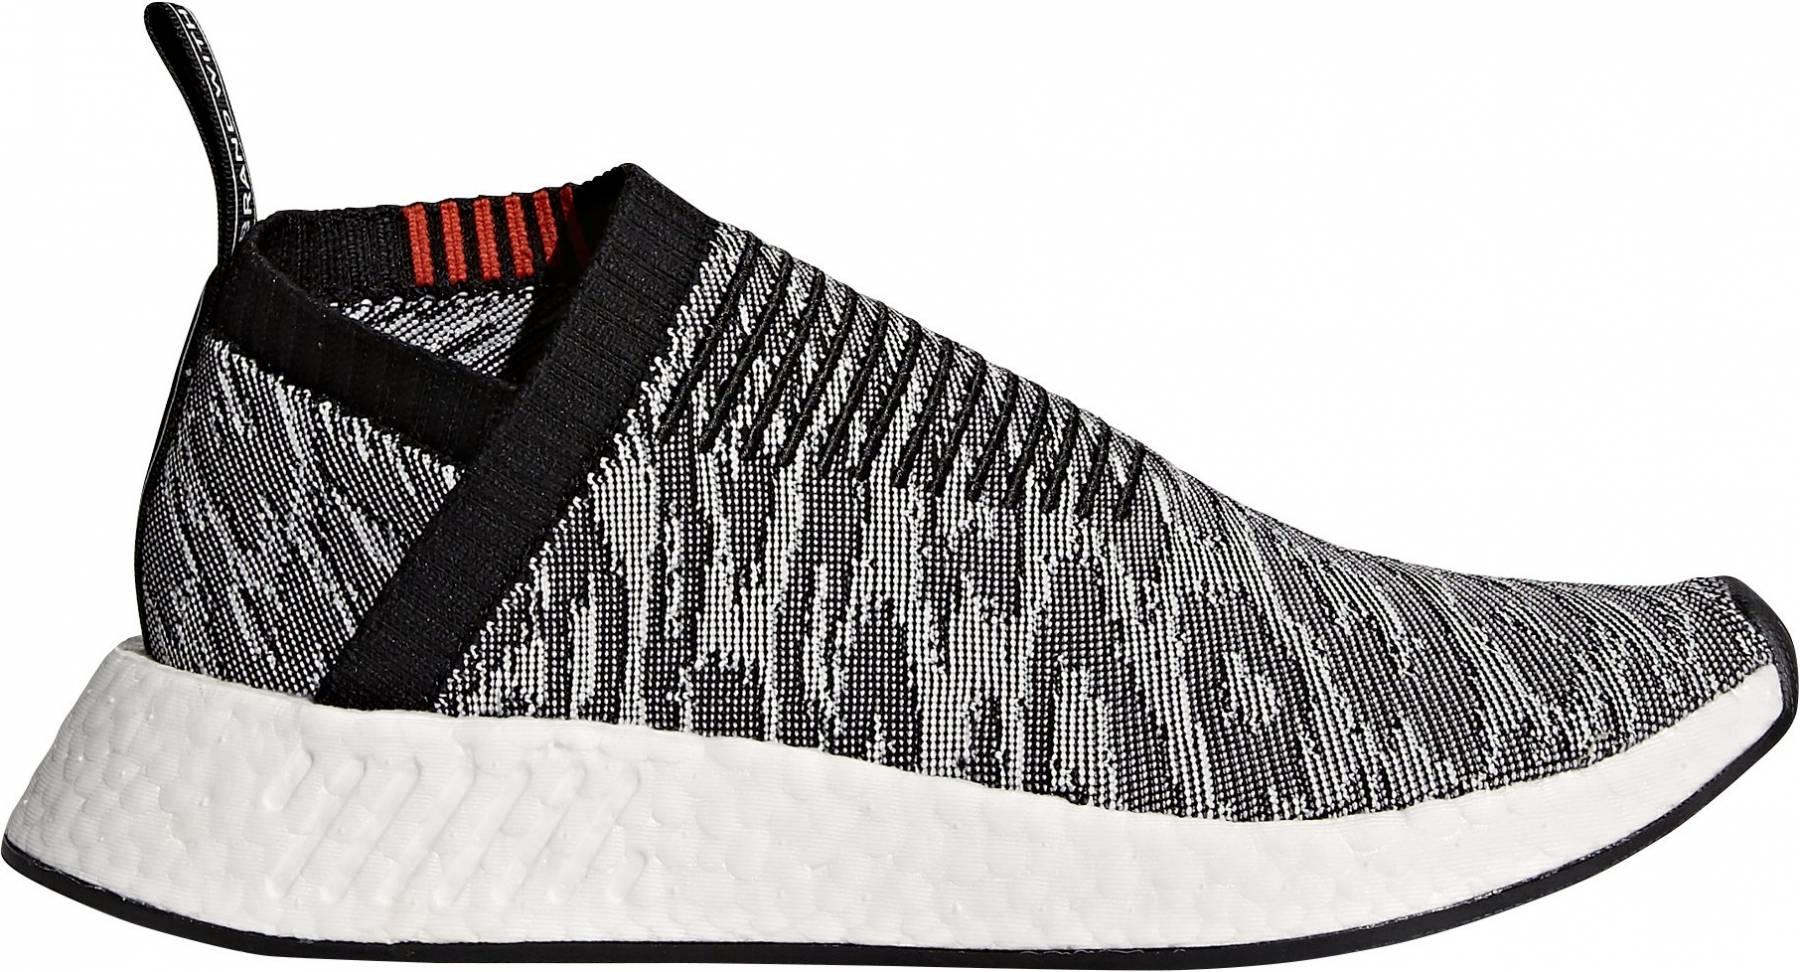 Adidas NMD_CS2 Primeknit sneakers in 8 colors (only $80) | RunRepeat